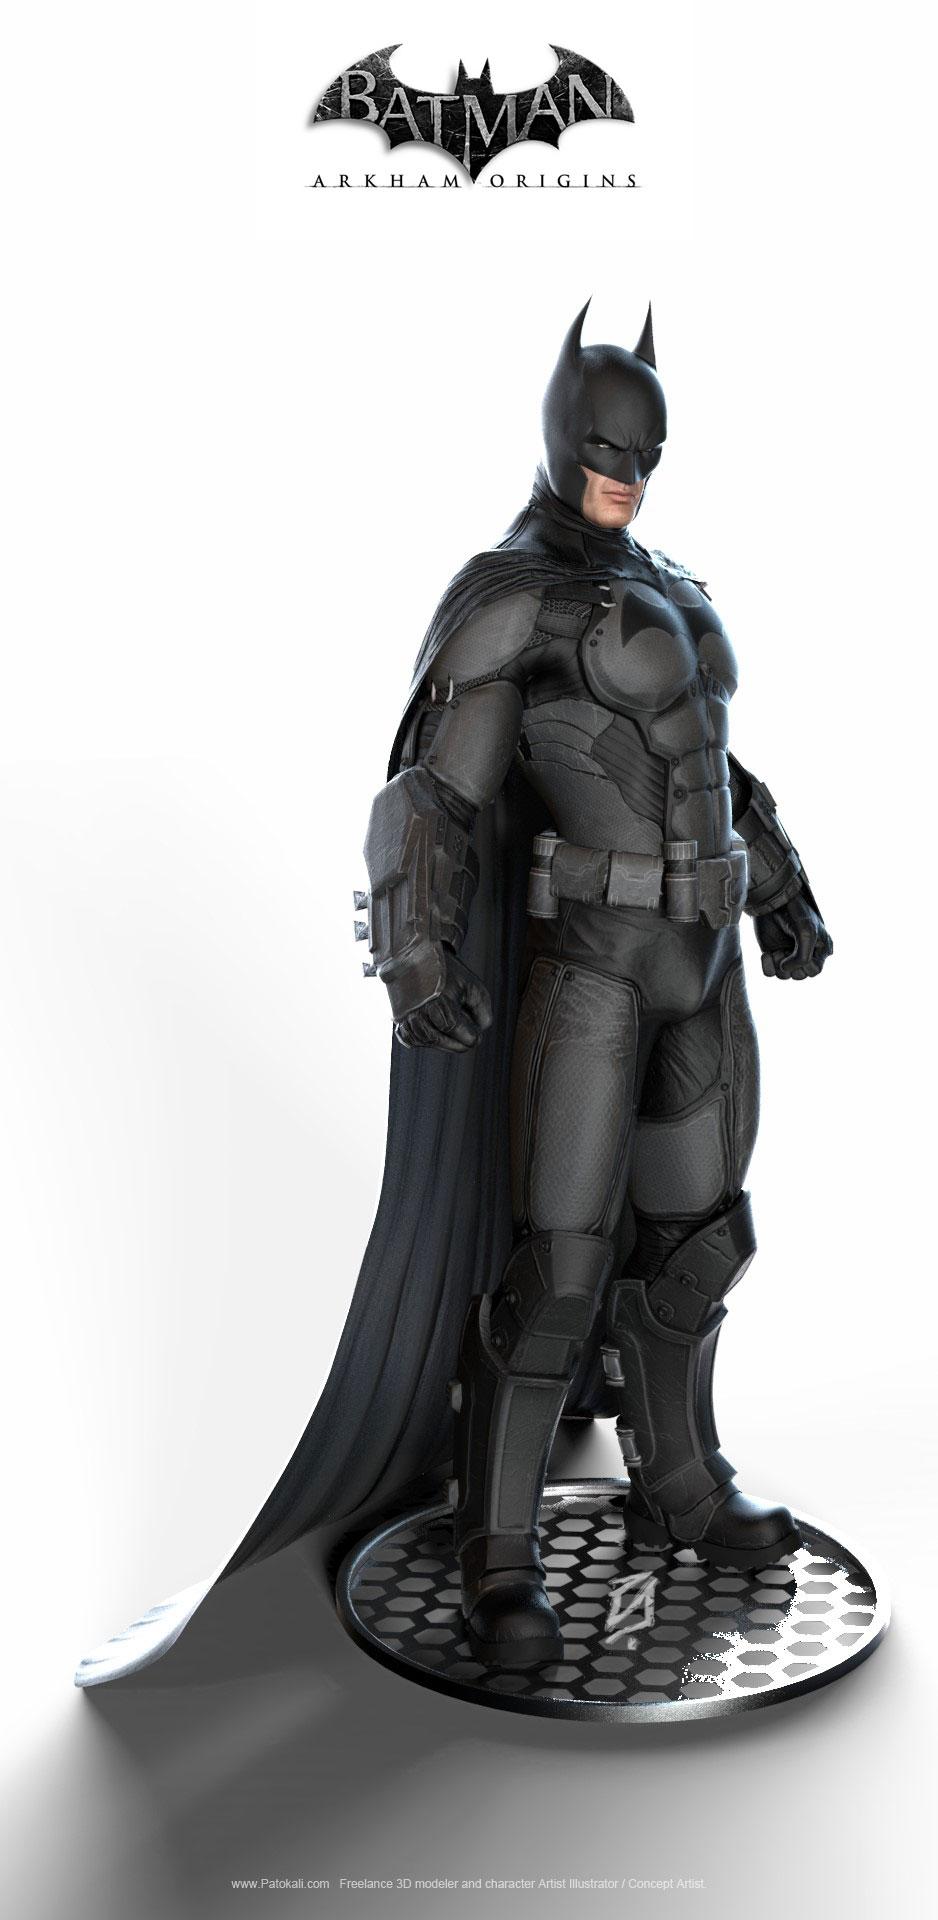 Batman arkham origins boneco